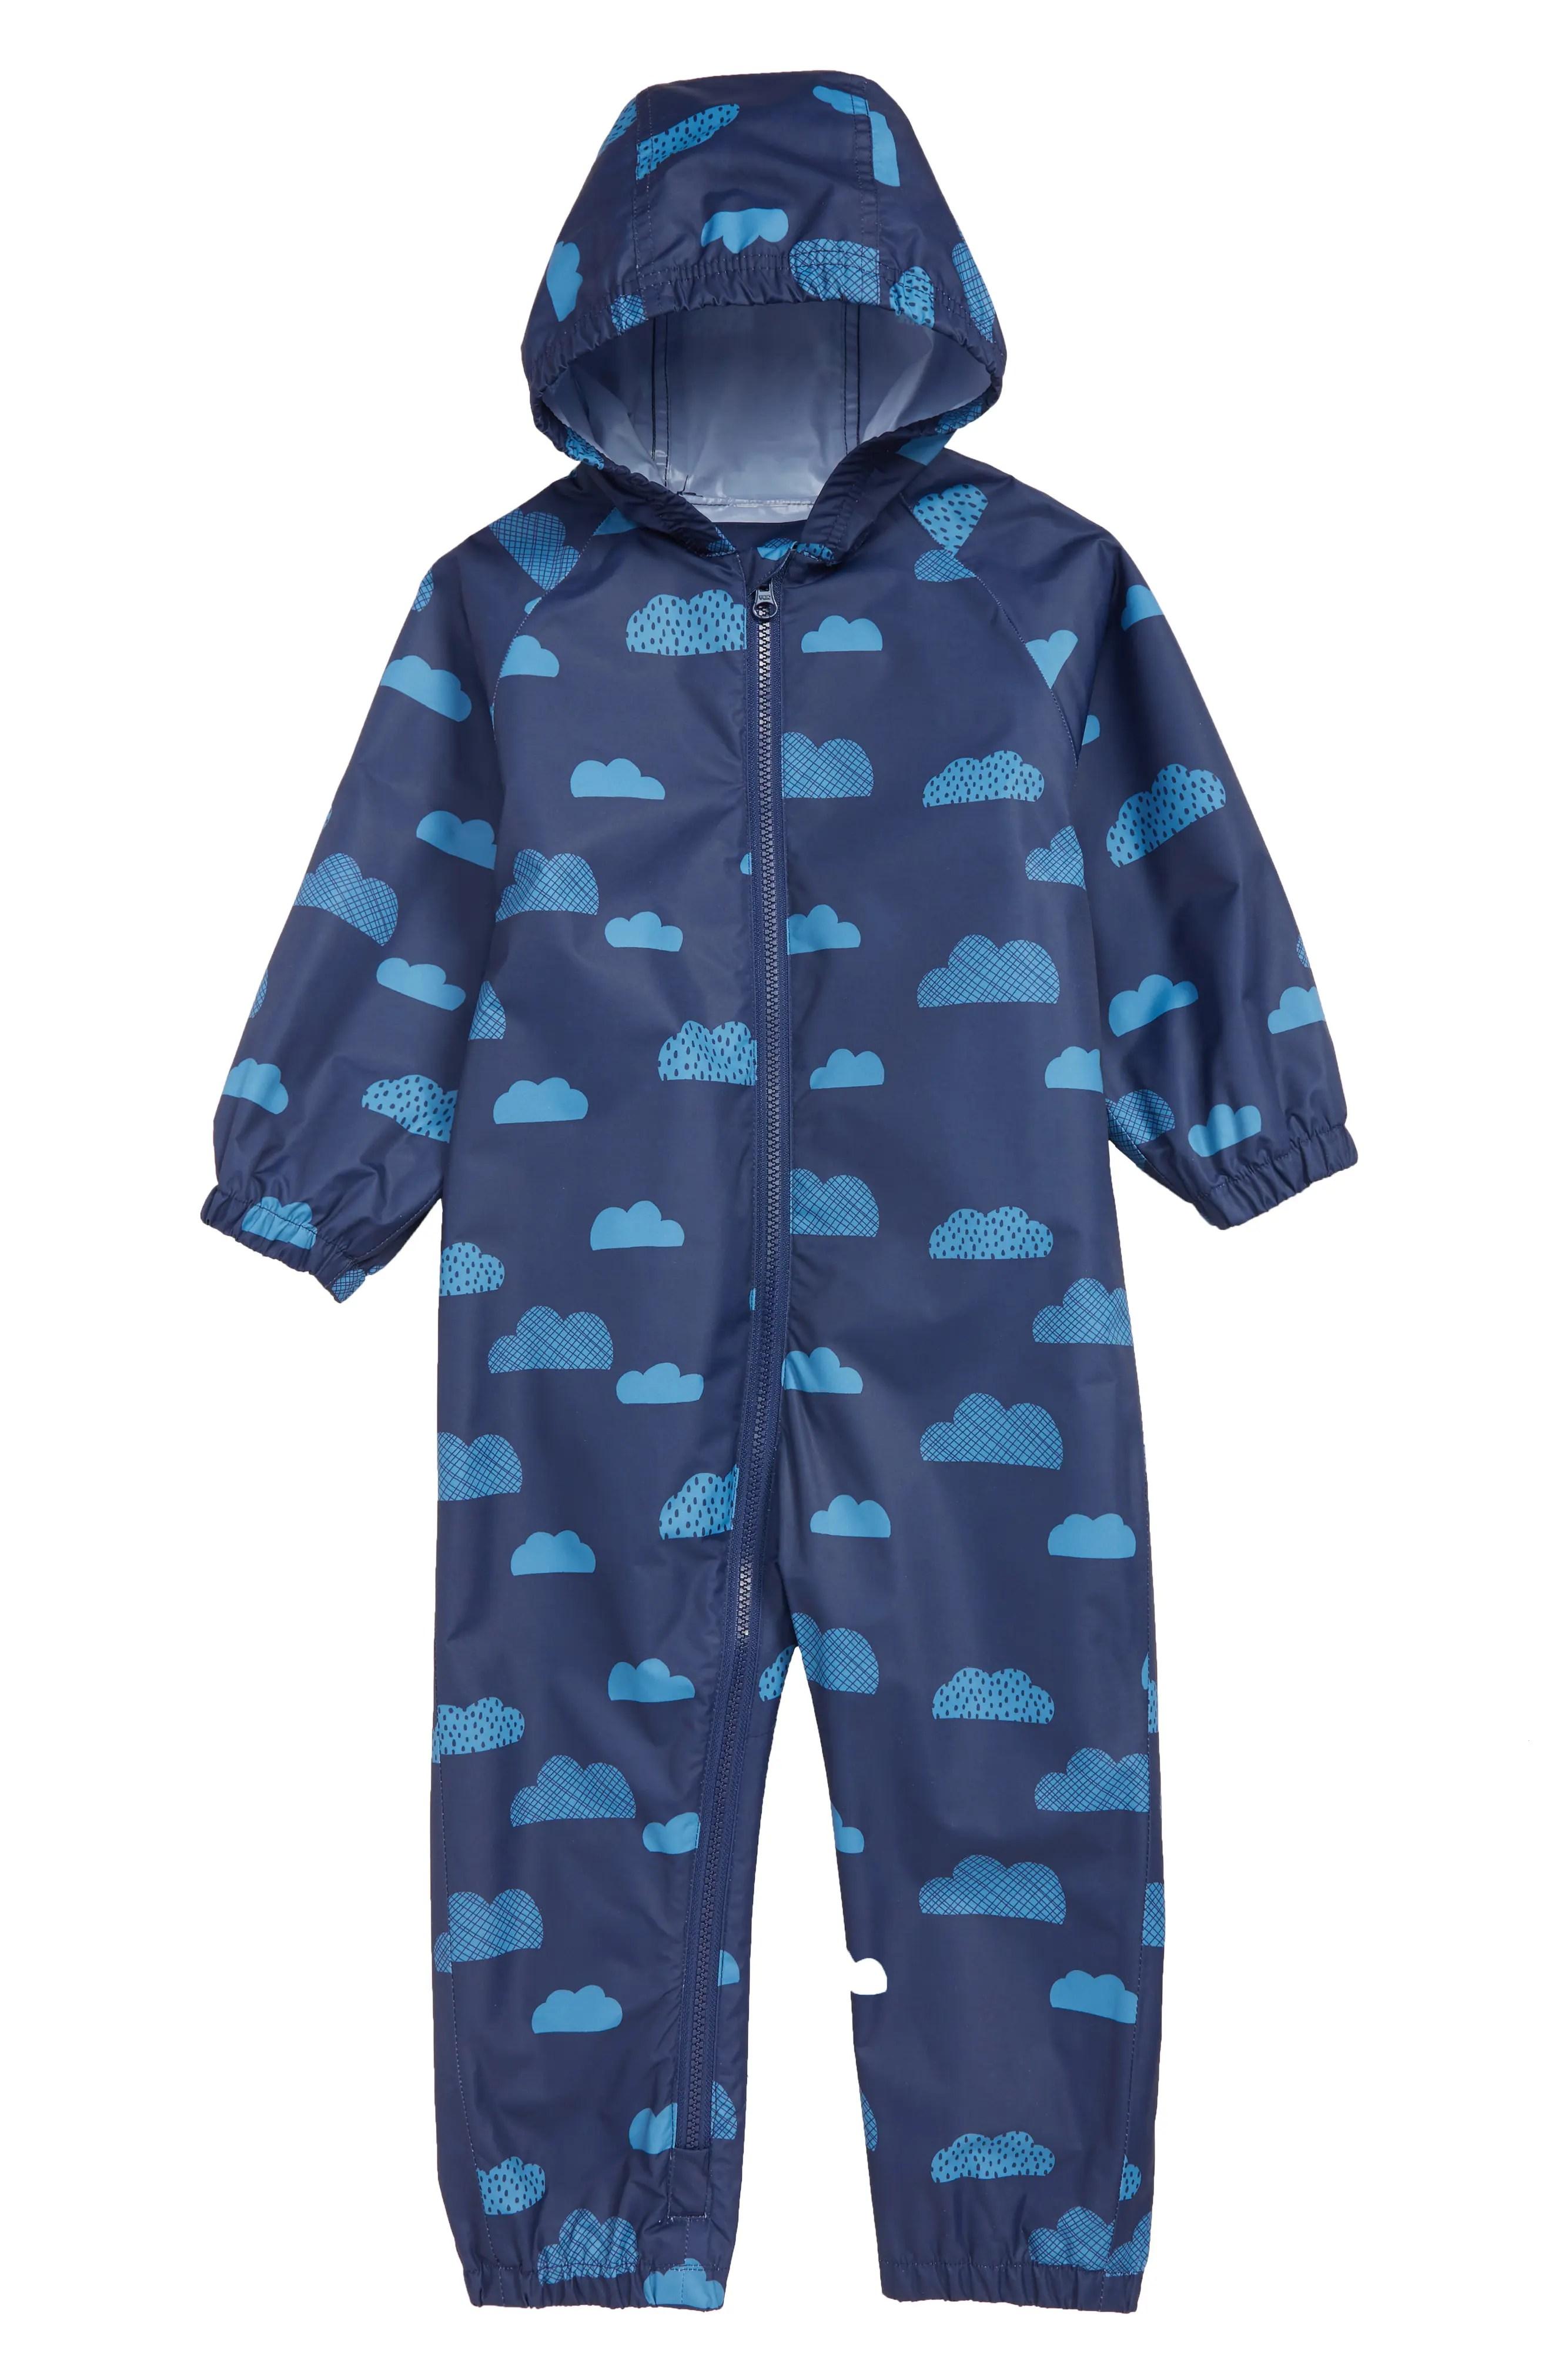 mini boden clouds waterproof hooded rain suit nordstrom rack